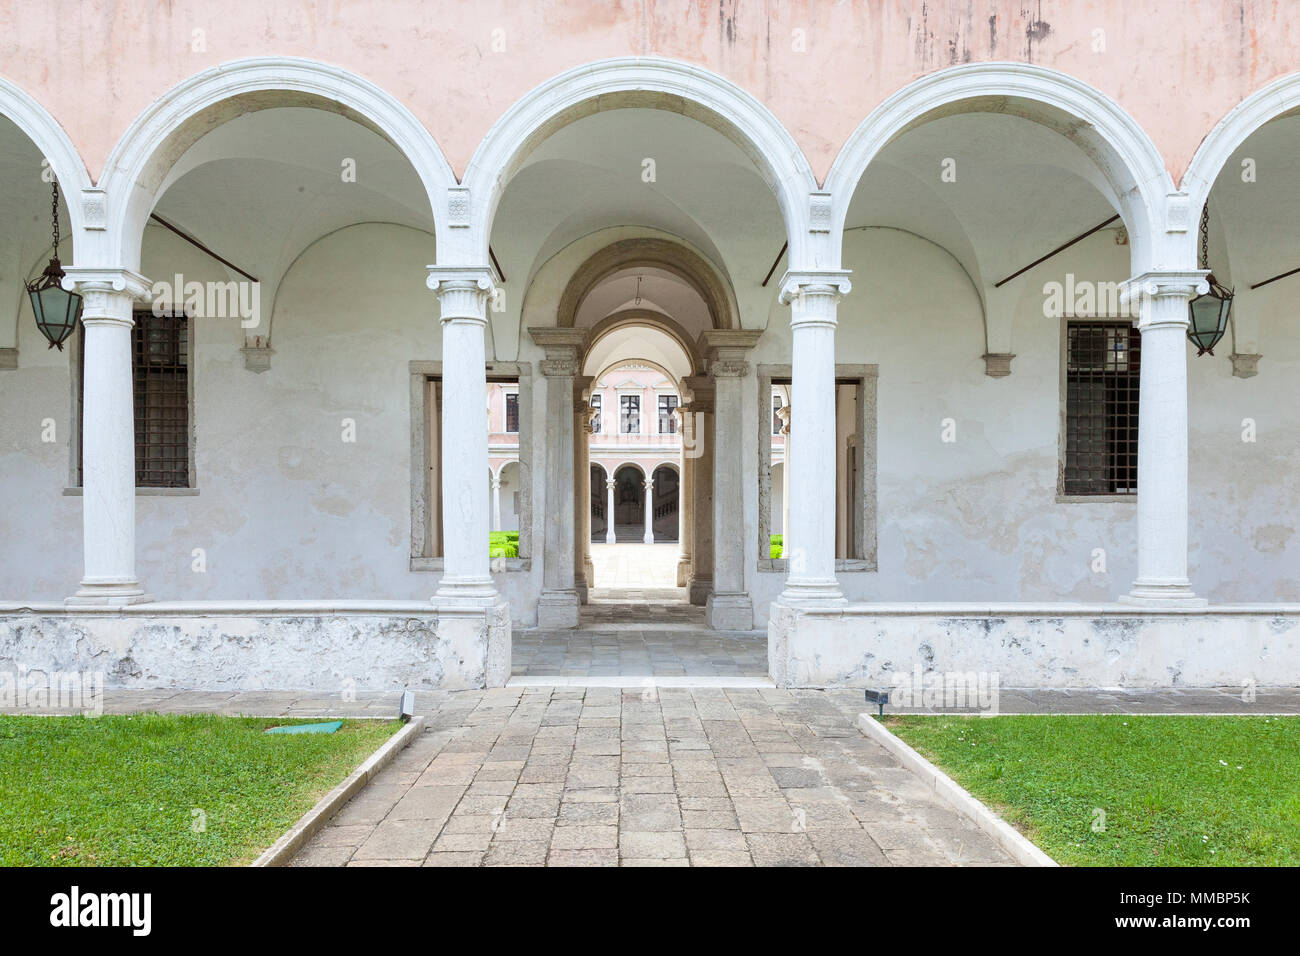 The Rennaissance Cypress Cloisters  in the Benedictine Monastery part of the Cini Foundation,  island of San Giorgio Maggiore, Venice, Veneto, Italy Stock Photo